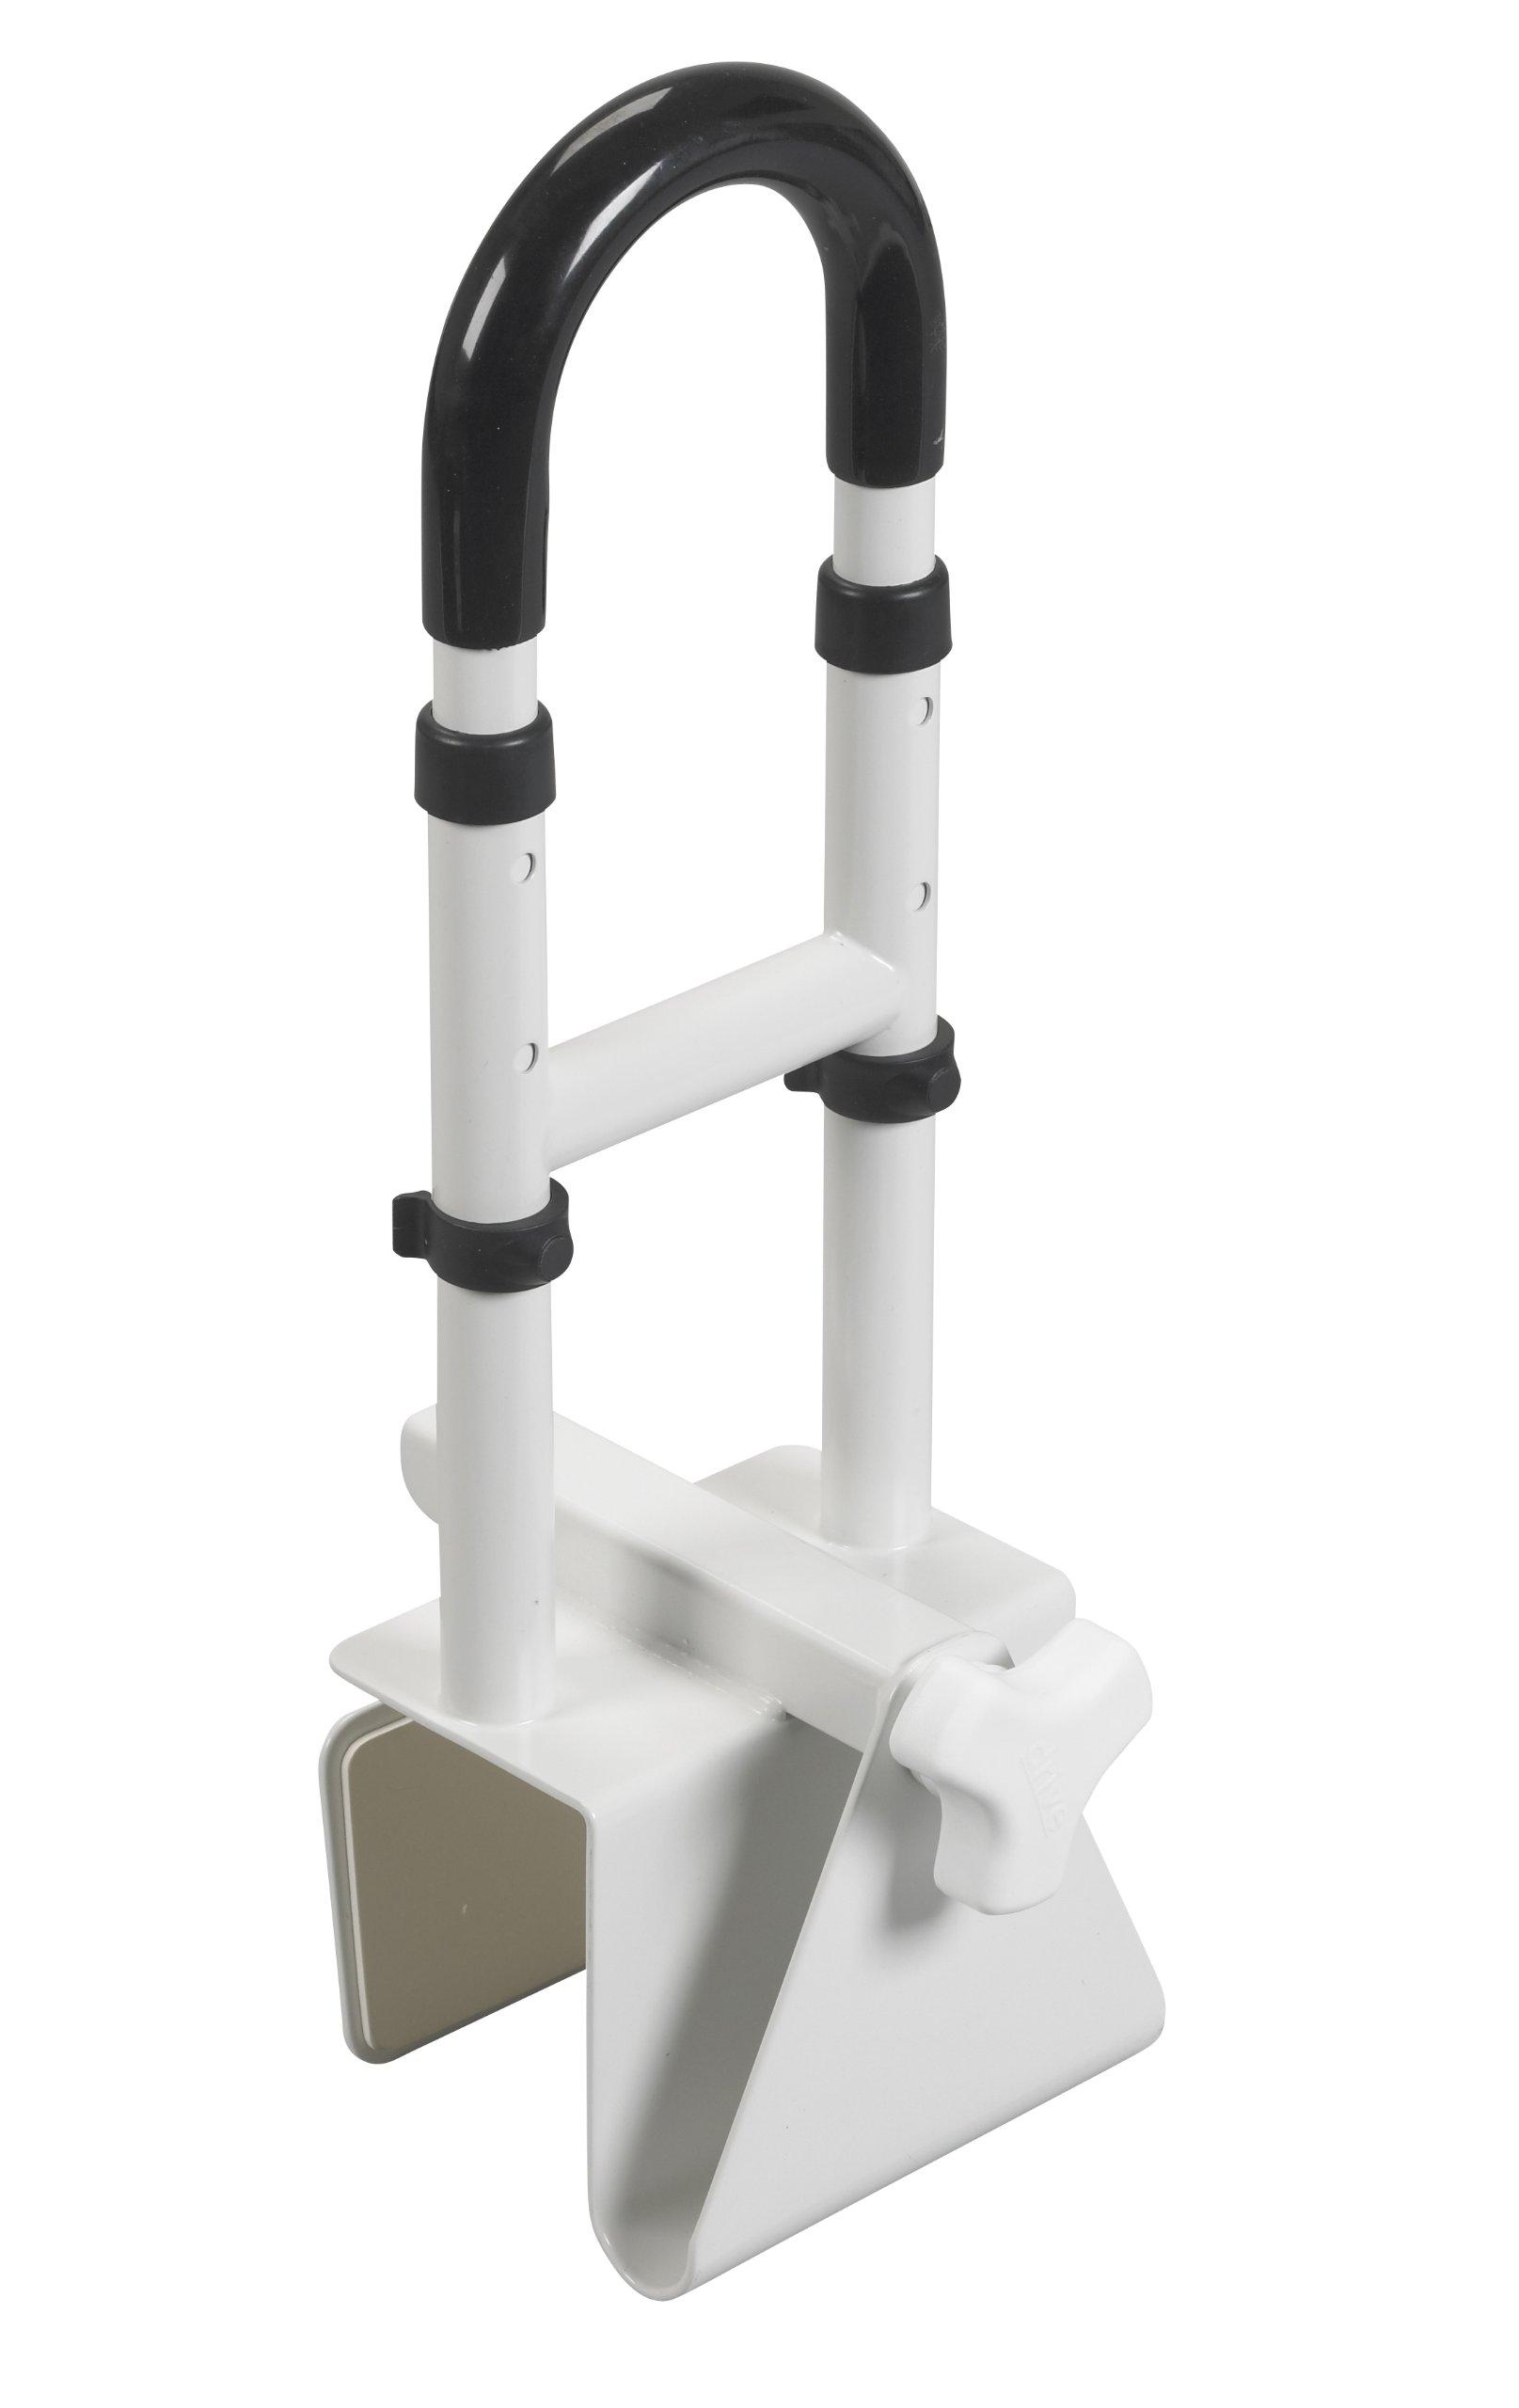 Drive Medical Adjustable Height Bathtub Grab Bar Safety Rail, White by Drive Medical